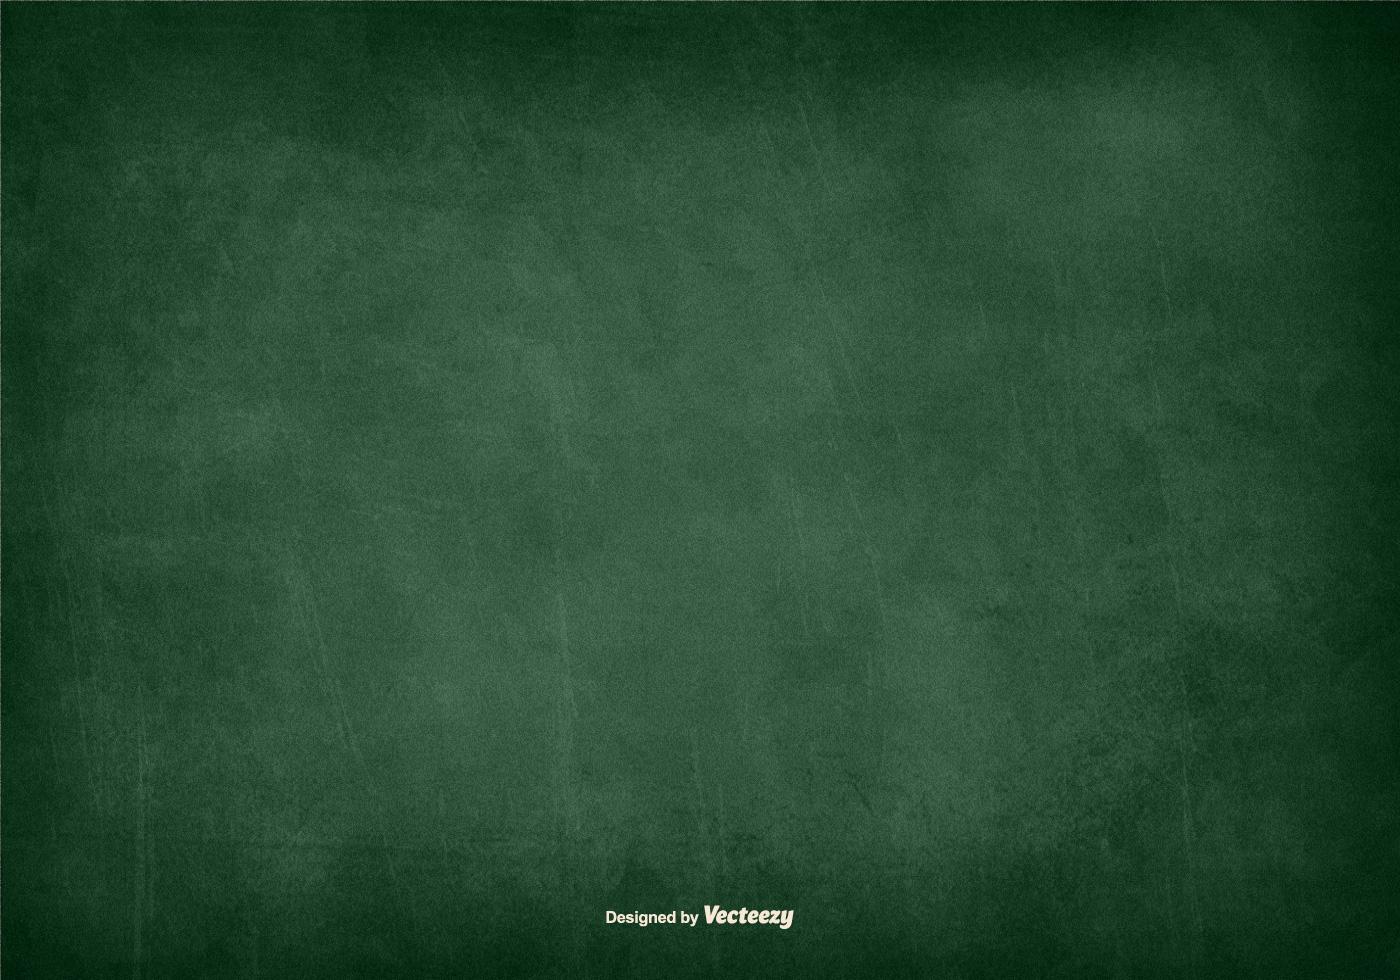 green chalkboard vector texture download free vector art stock graphics images